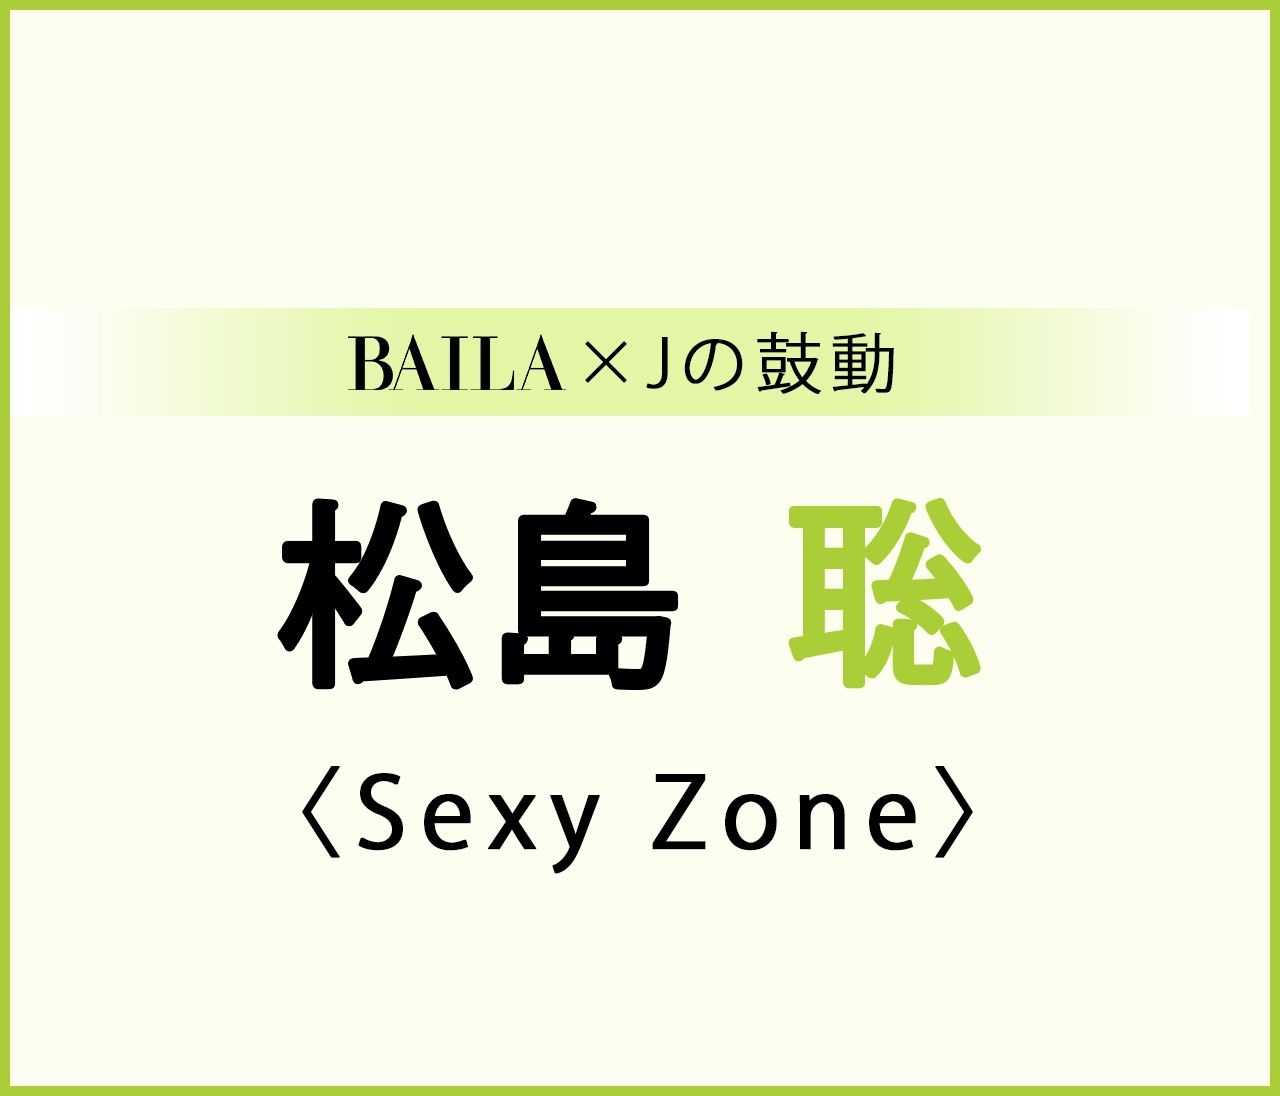 【Sexy Zone】松島聡スペシャルインタビュー!【BAILA × Jの鼓動】